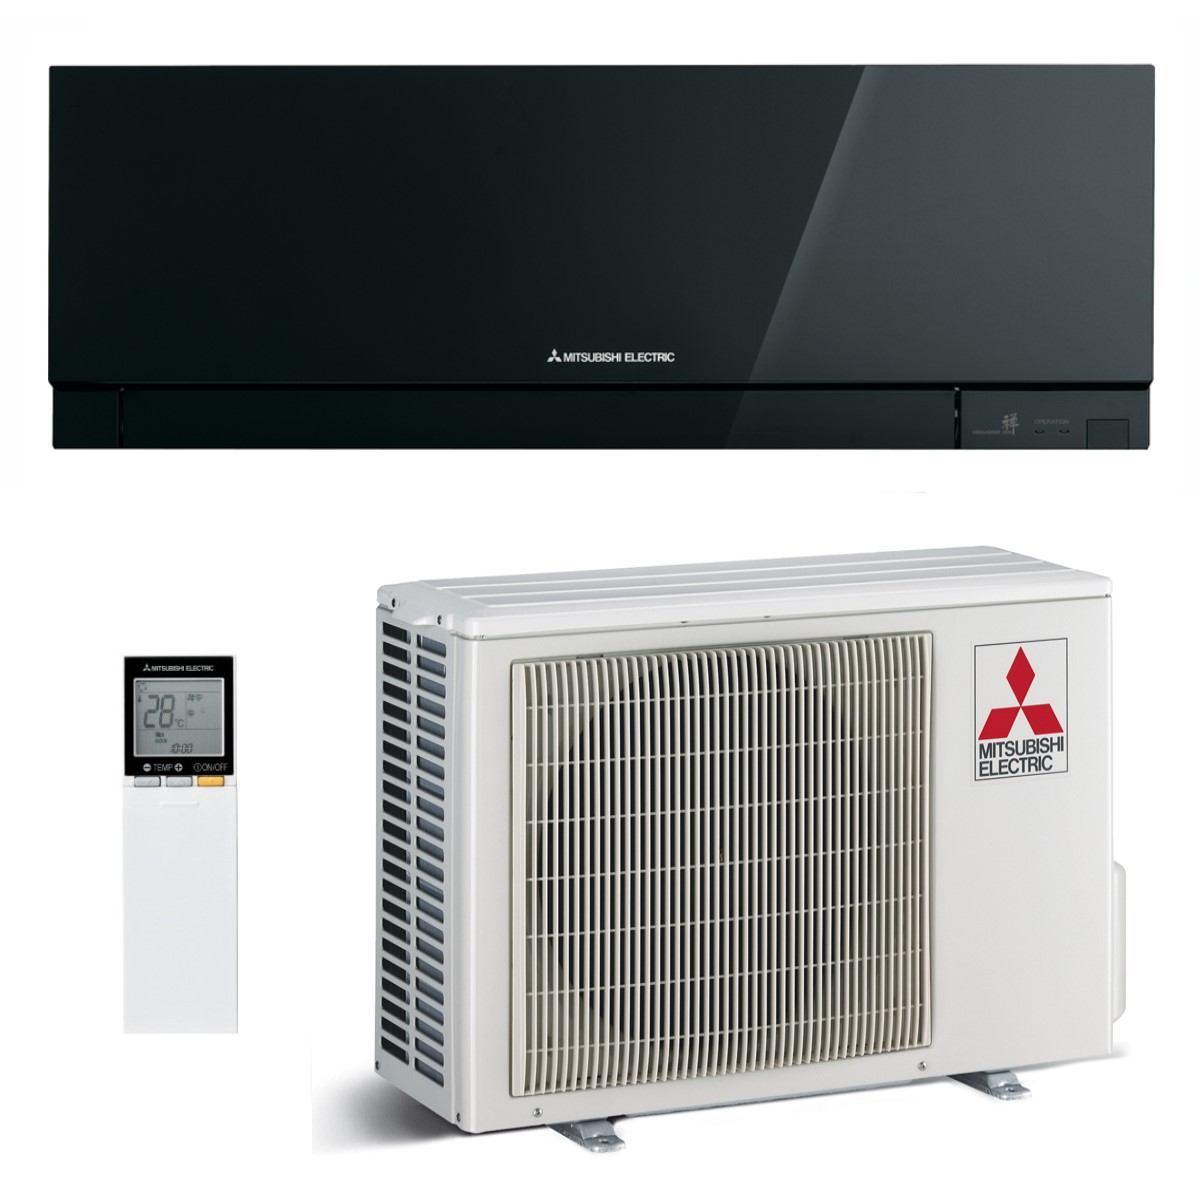 MITSUBISHI ELECTRIC KLIMA UREĐAJ MSZ-EF25VGB/MUZ-EF25VG R32